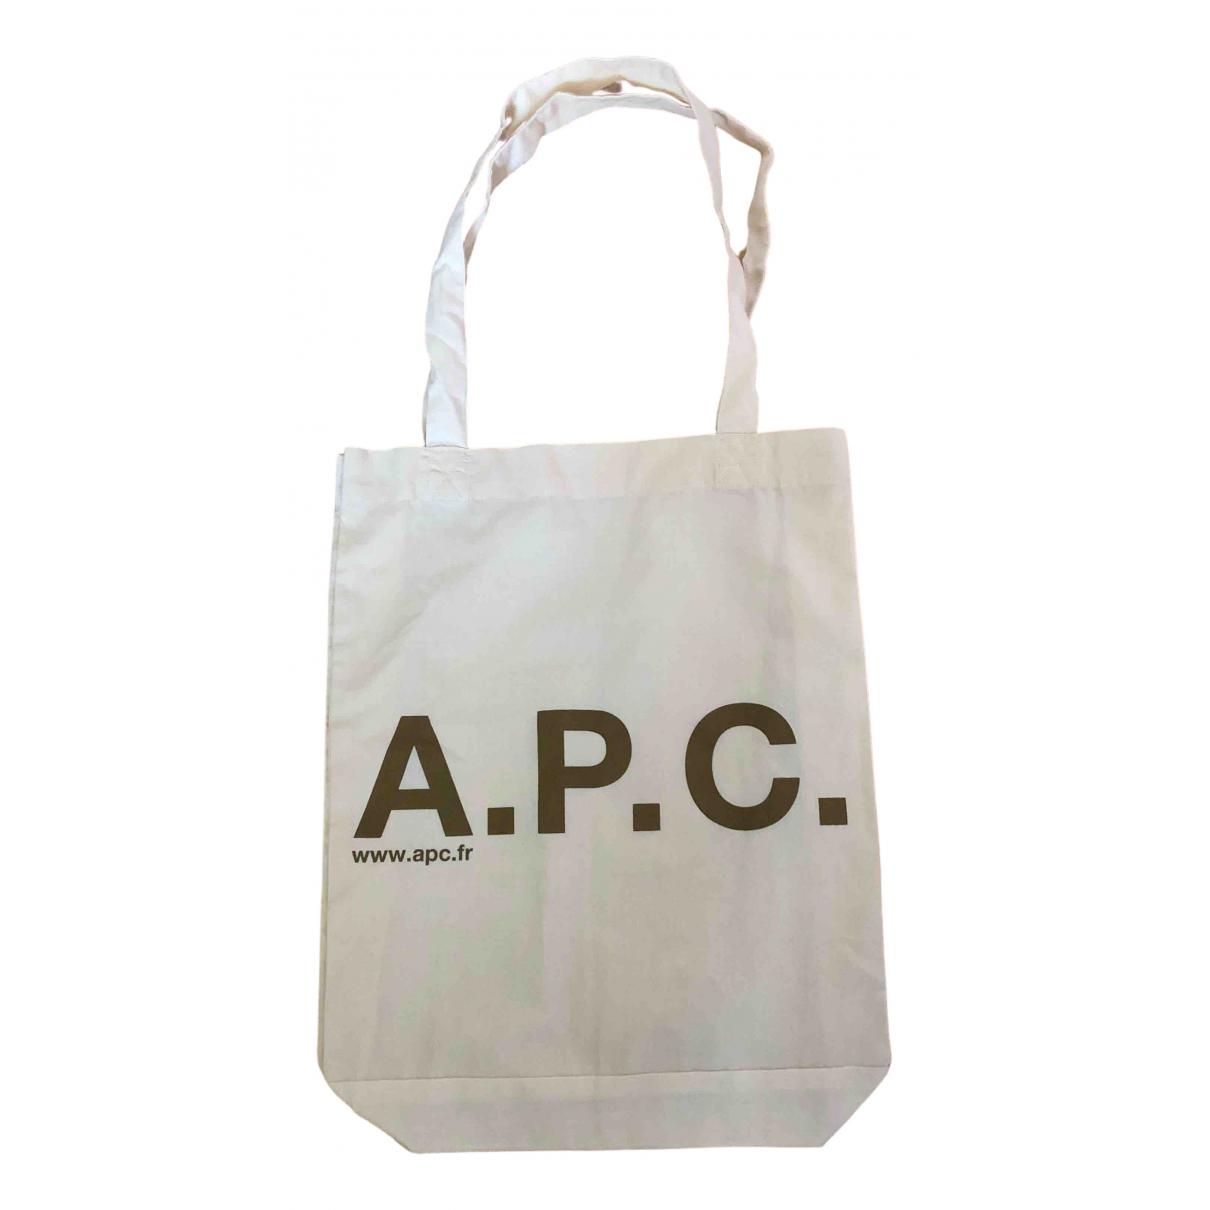 Apc - Sac a main   pour femme en coton - ecru